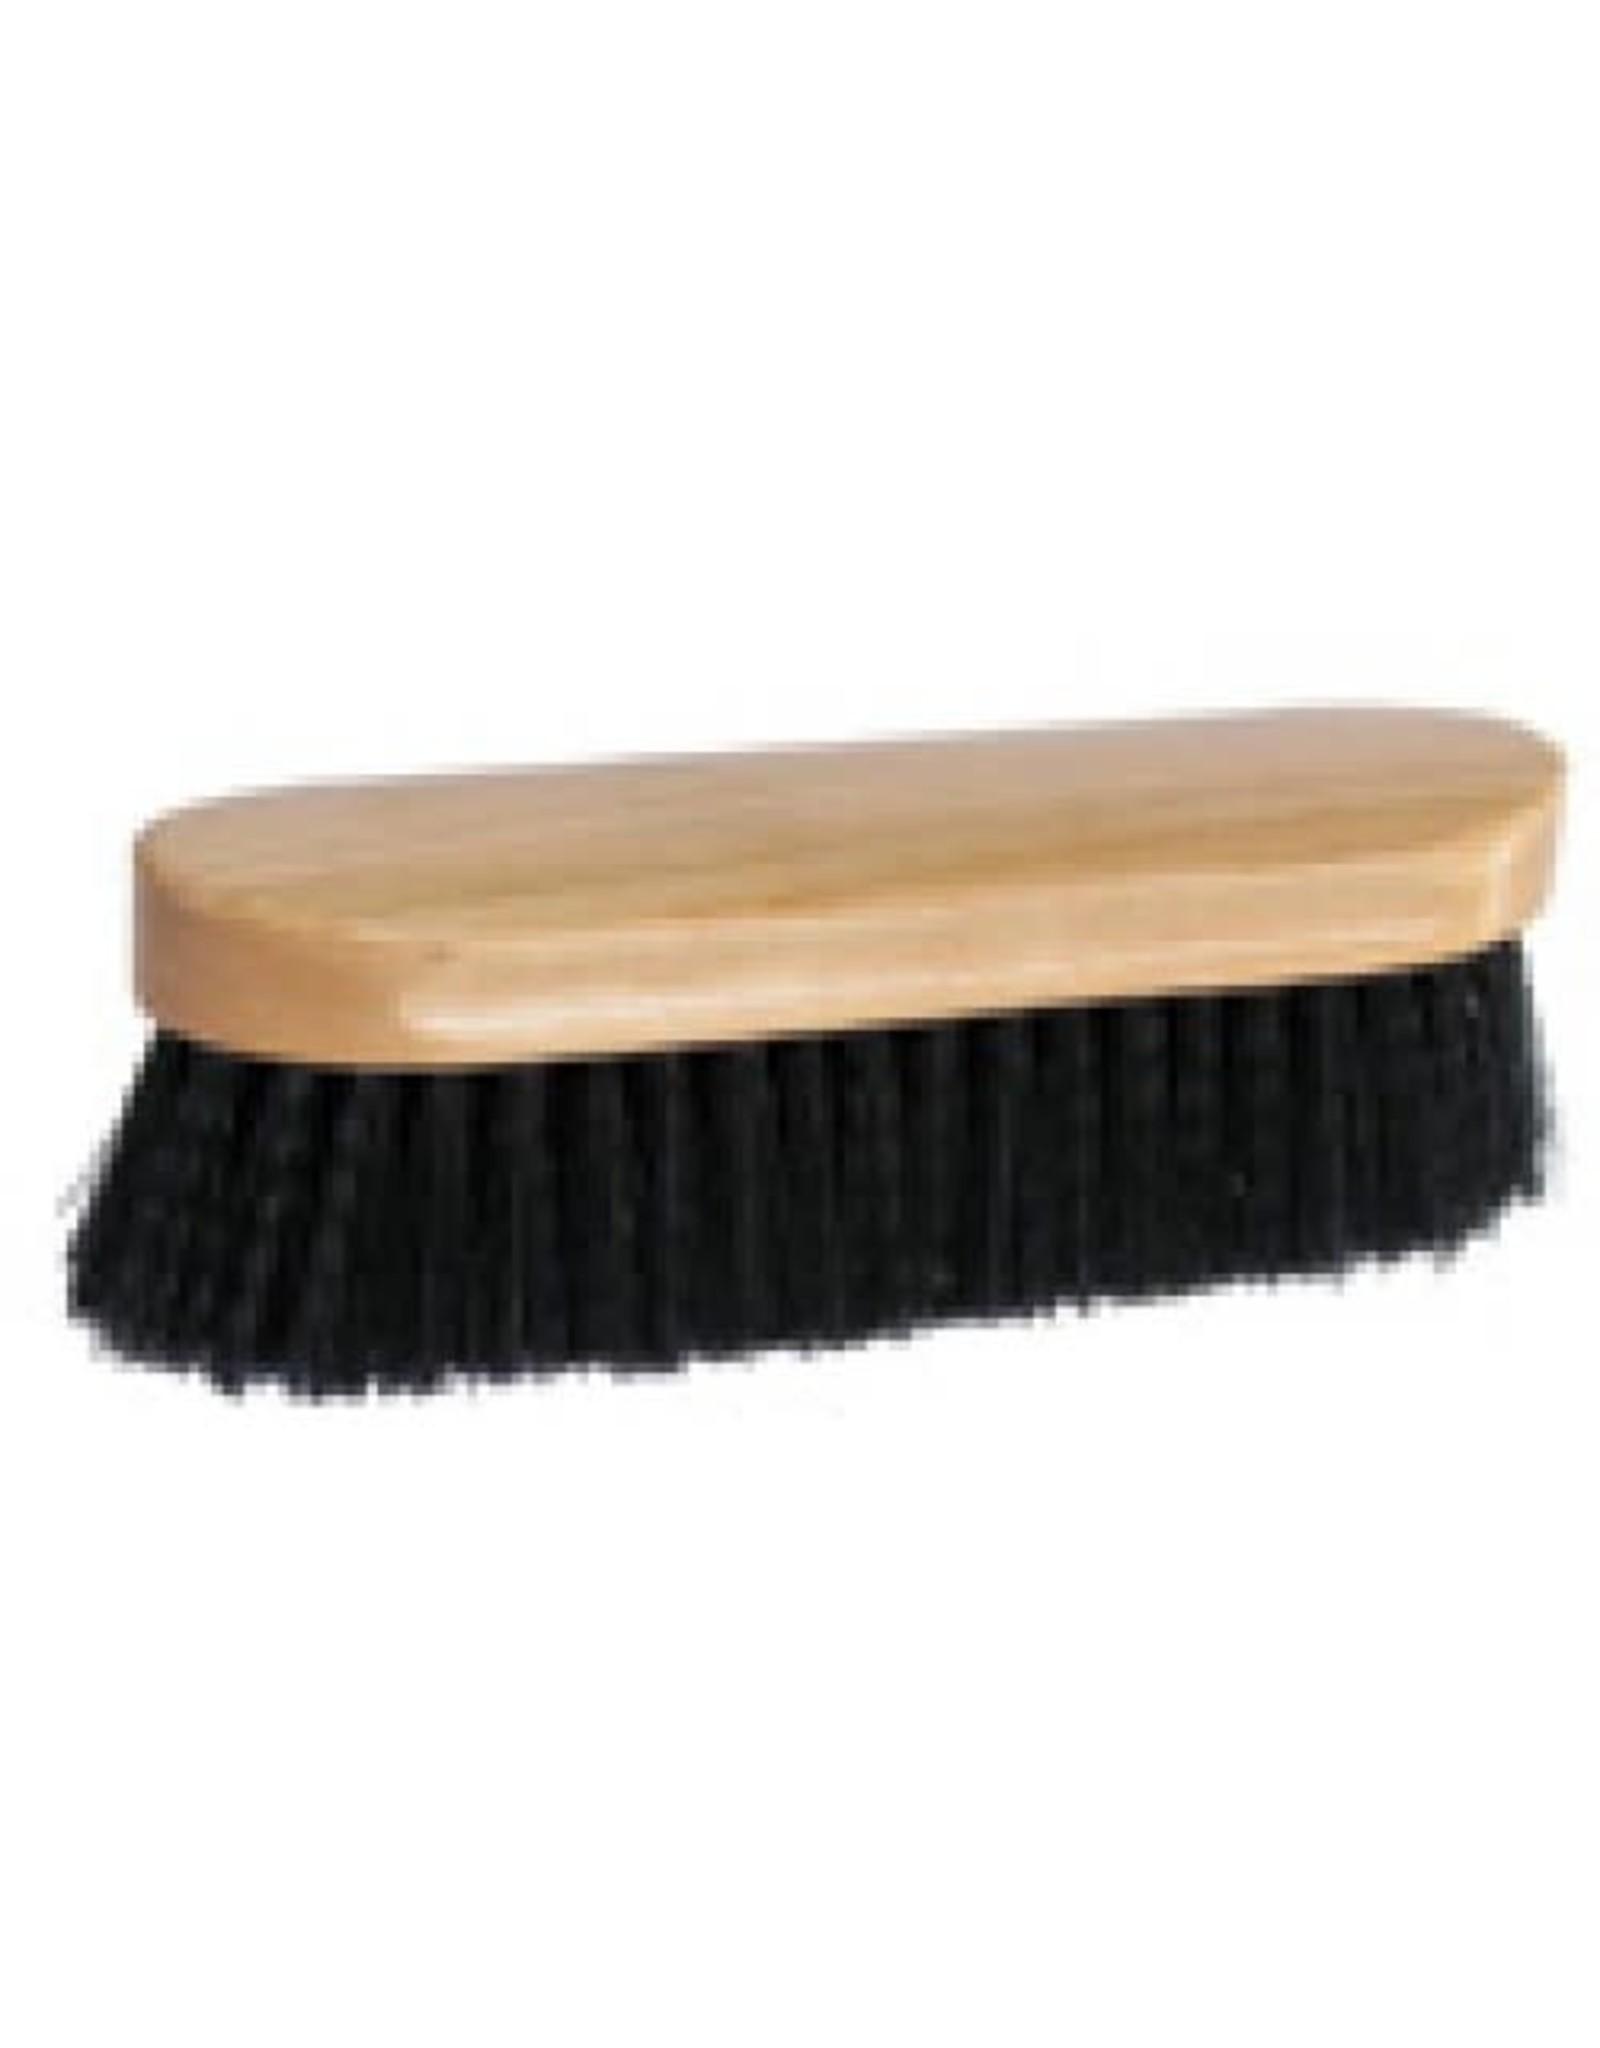 Brush/Stiff Dandy Black - 374316-27 ***Back Ordered***